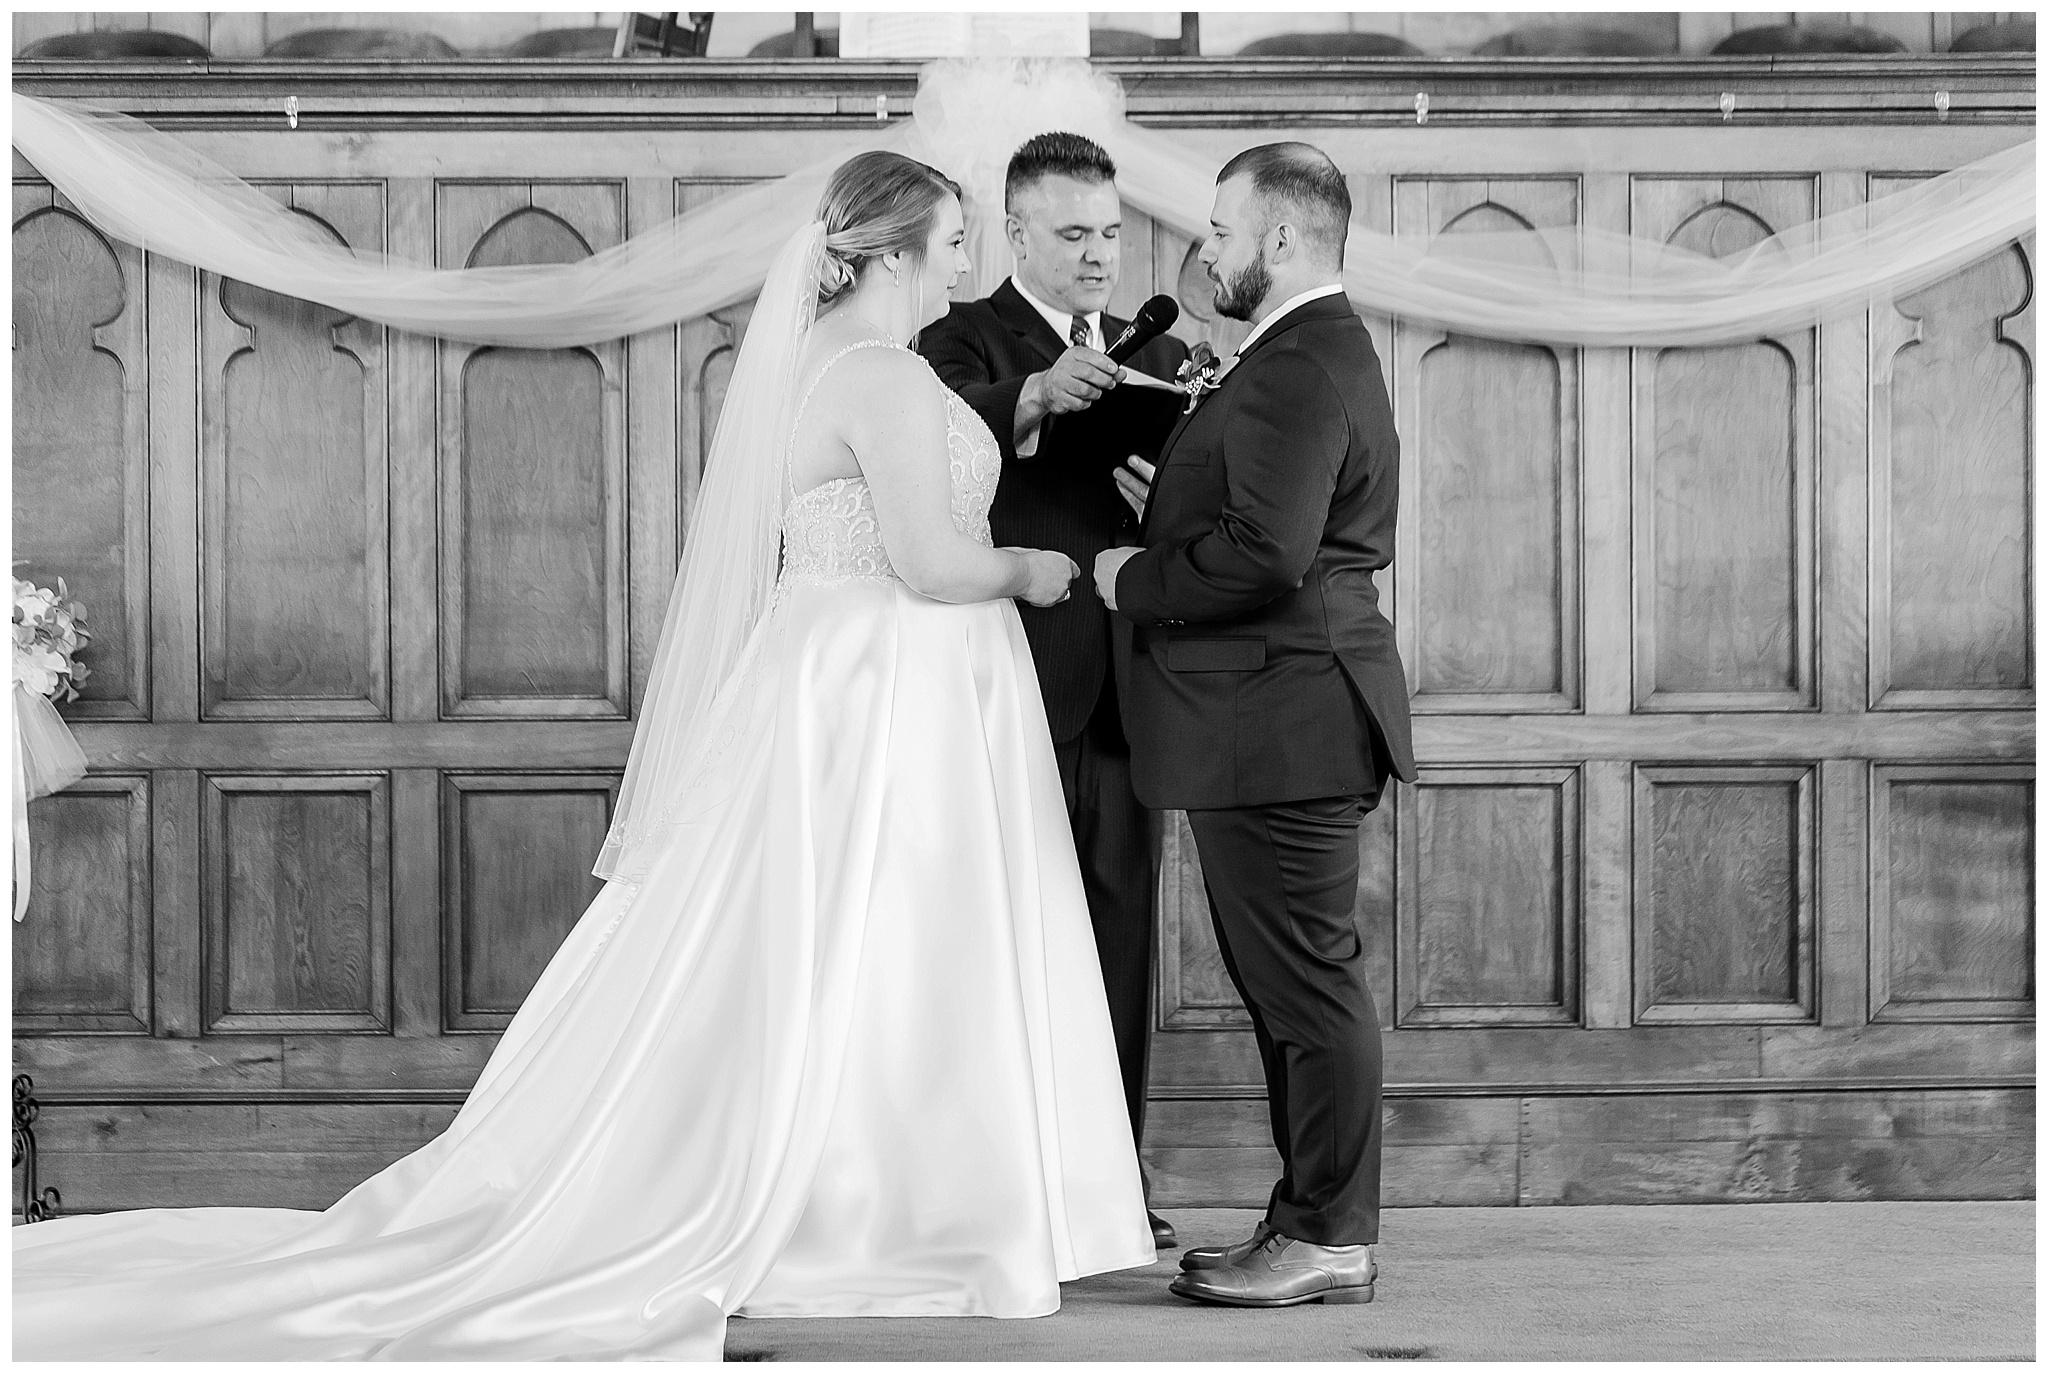 la_casa_grande_wedding_beloit_wisconsin_caynay_photo_0012.jpg